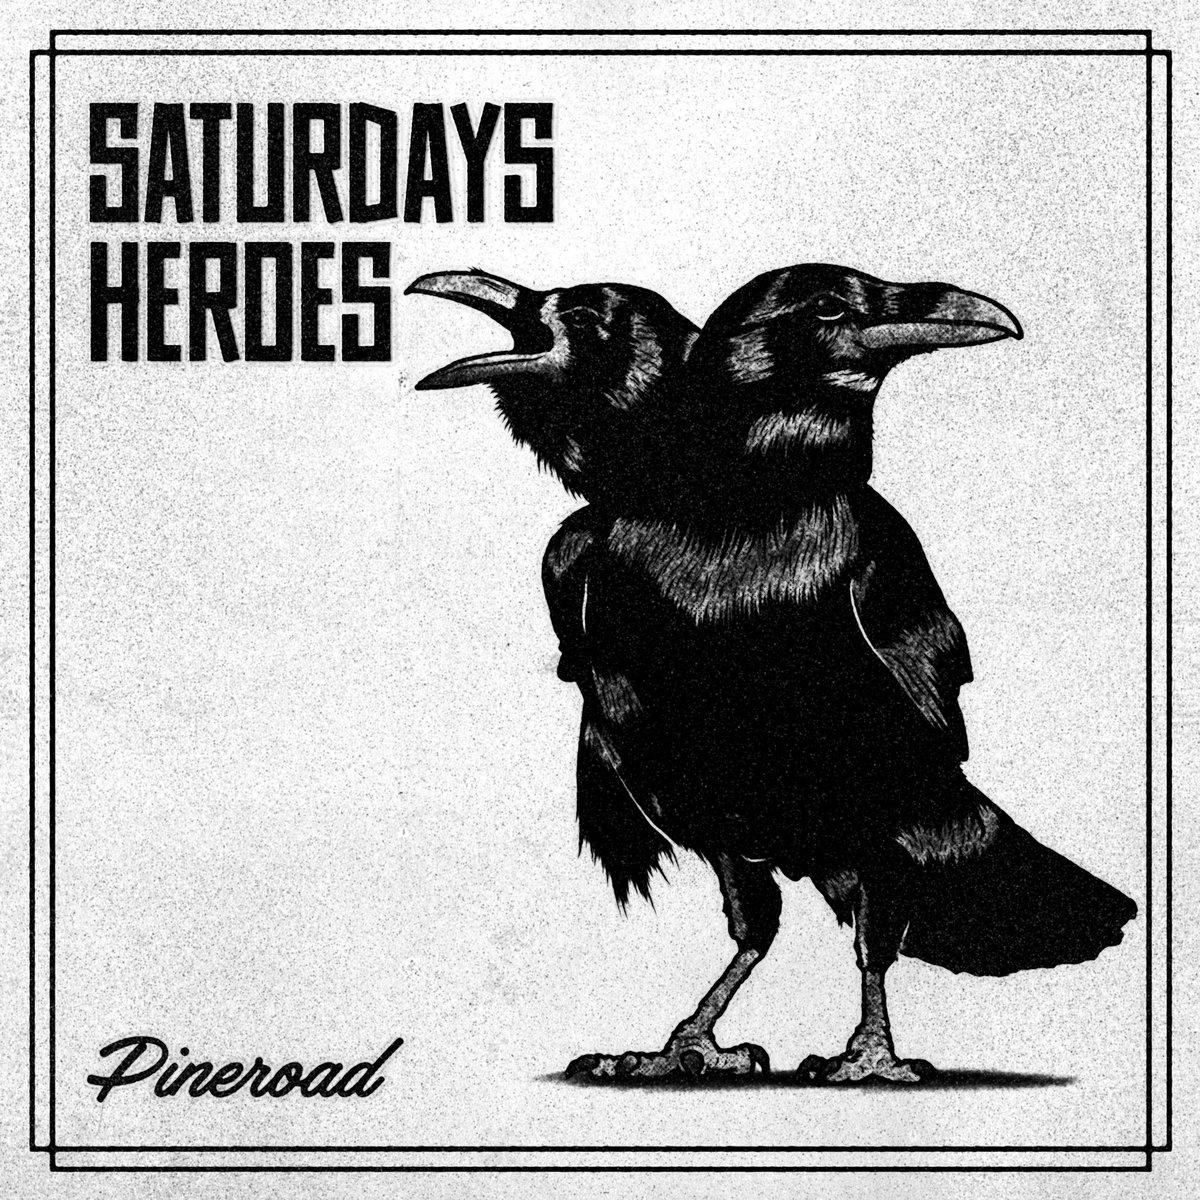 saturdays heroes pineroad album cover